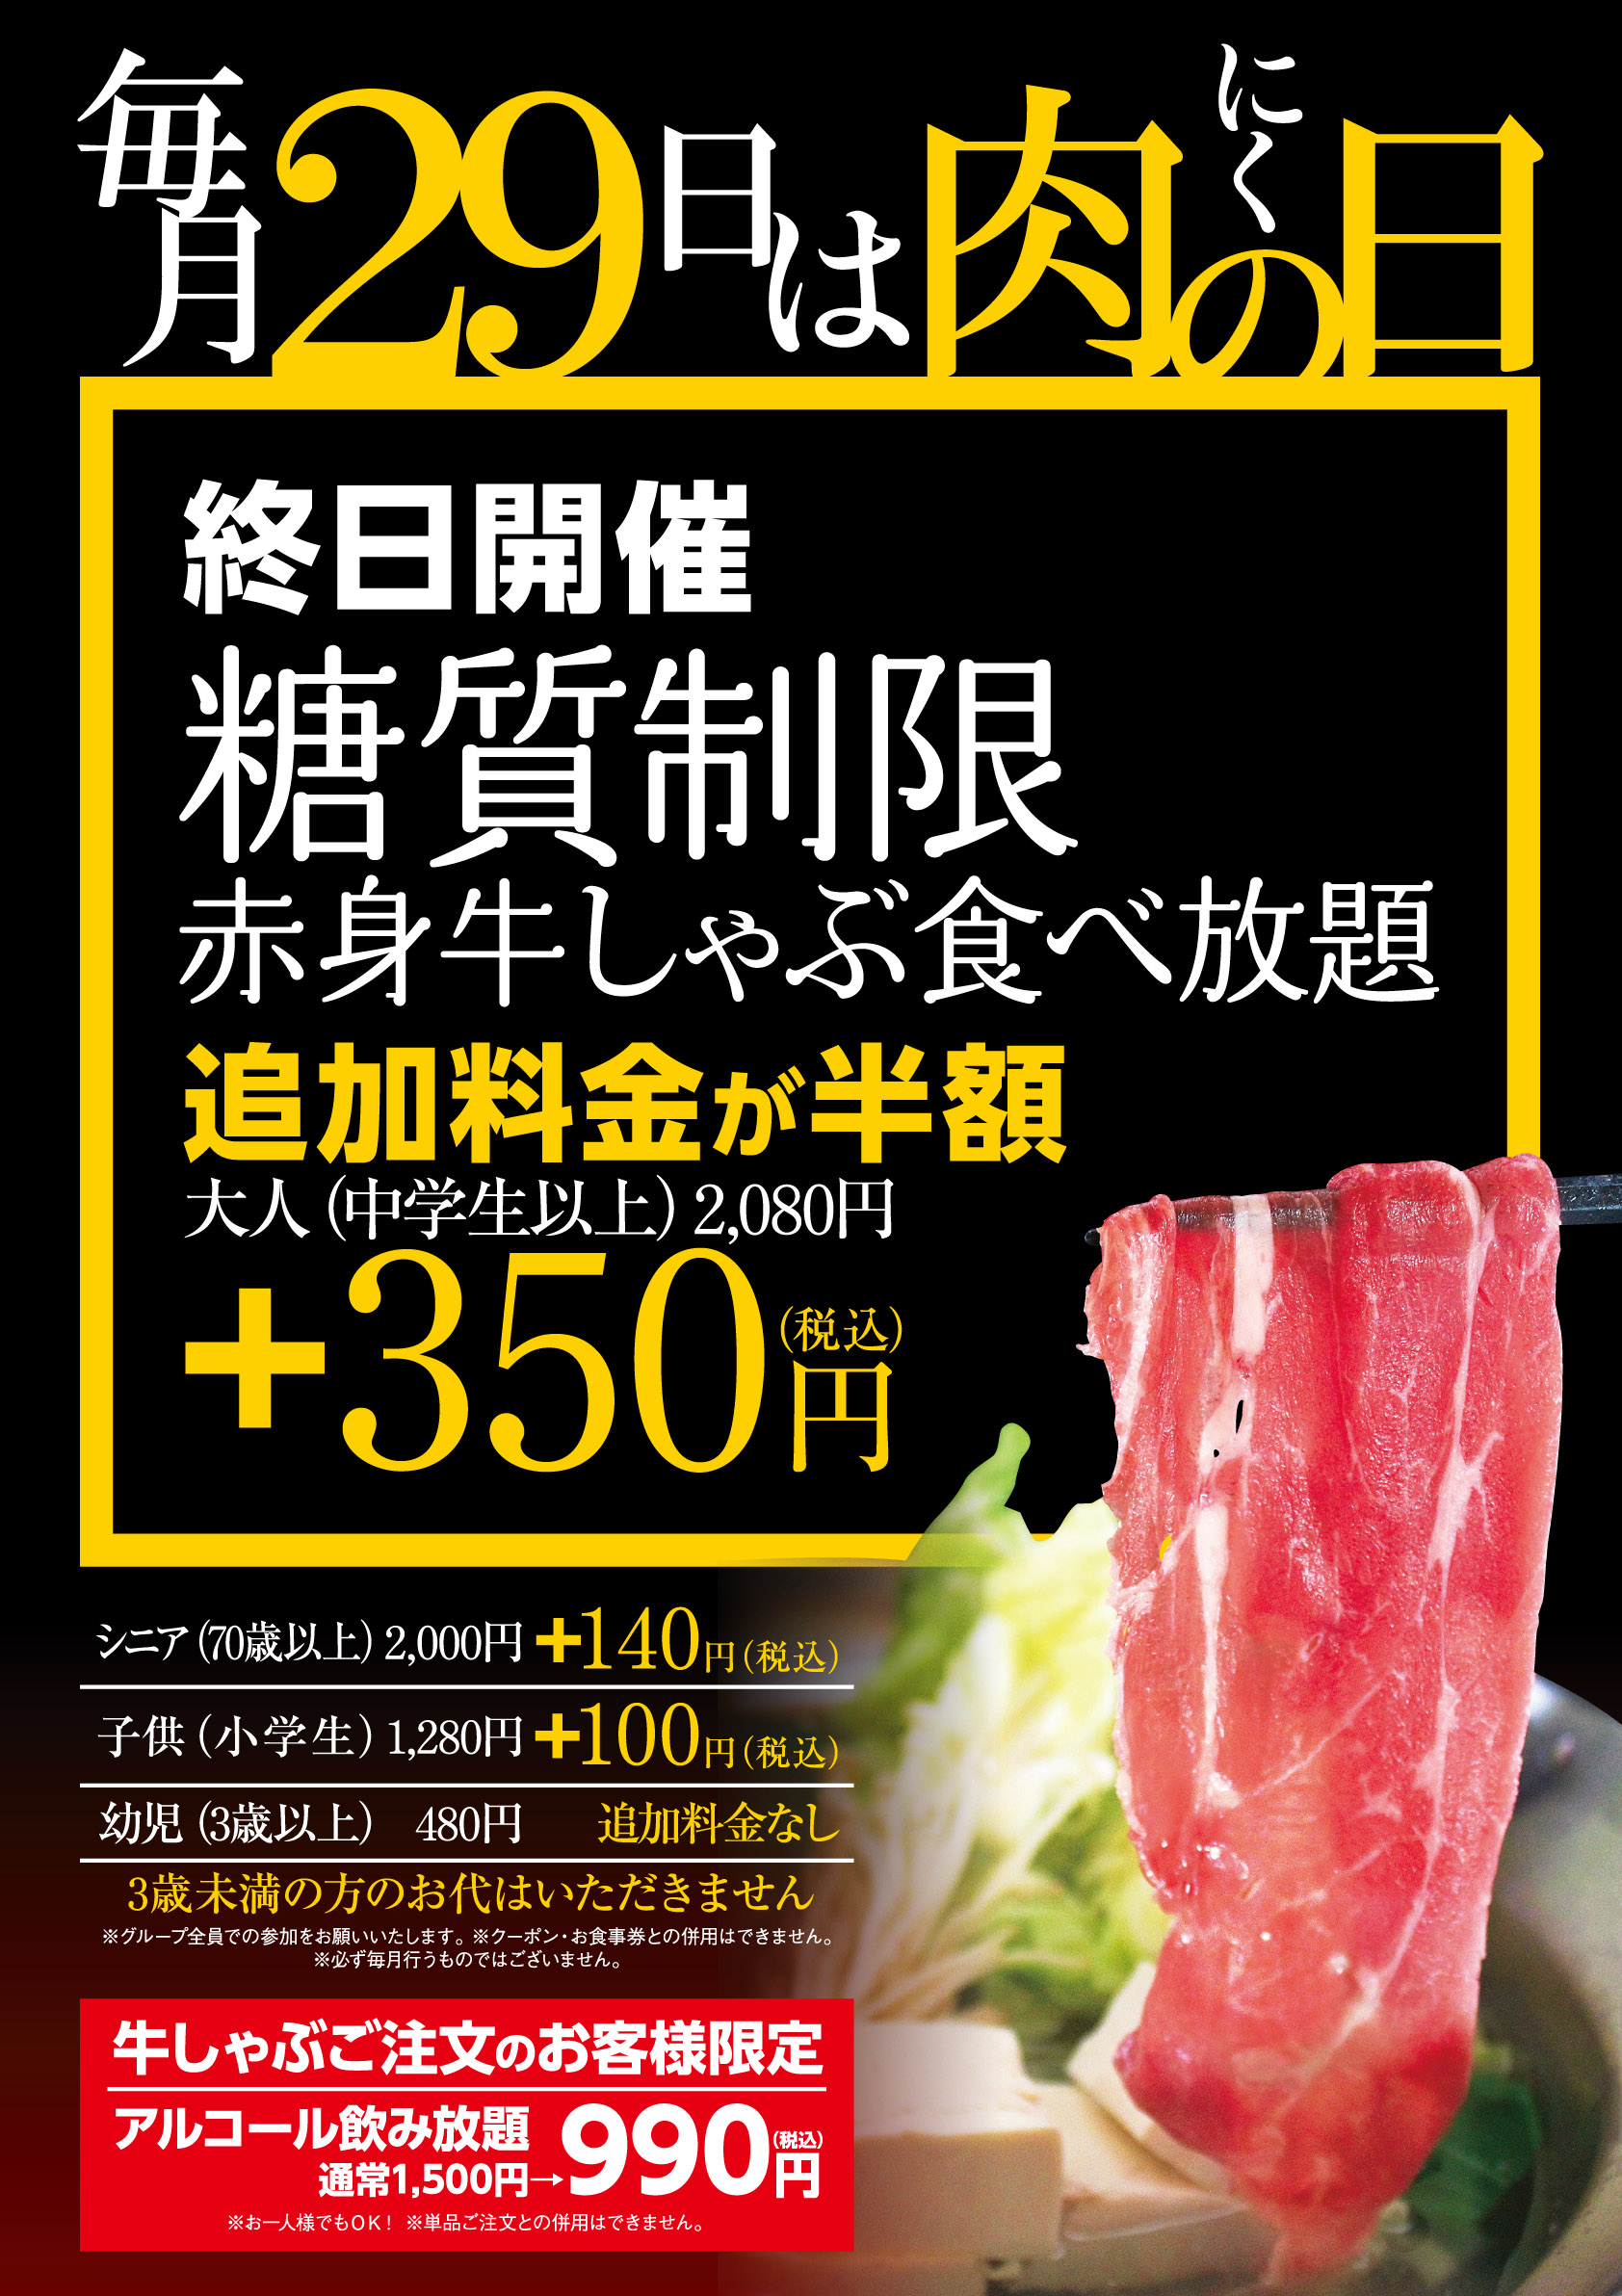 Roan肉の日ポスターA1